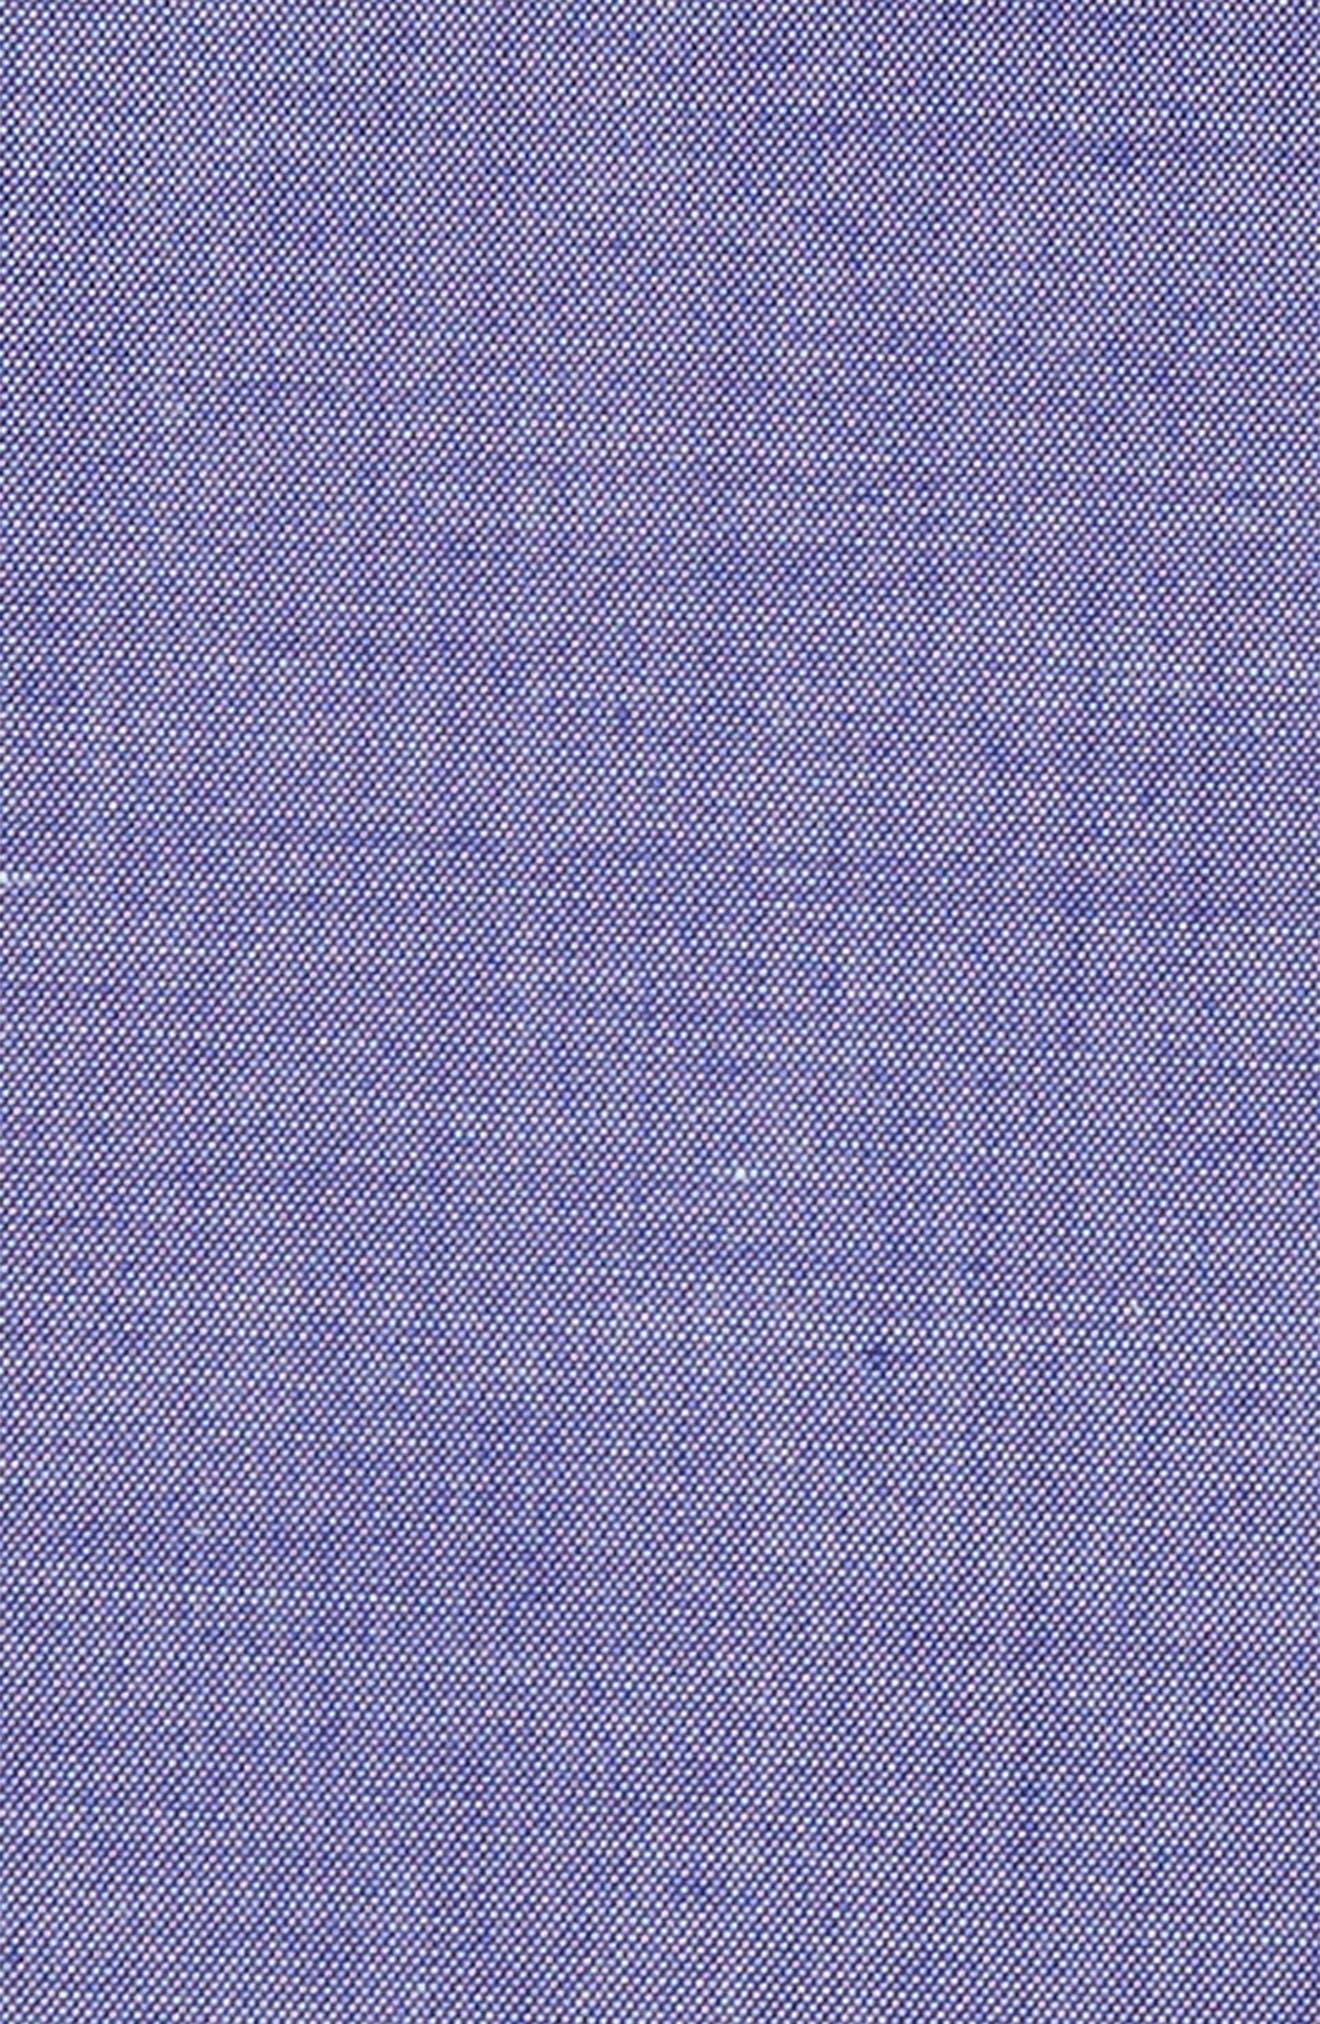 Chambray Pocket Square,                             Alternate thumbnail 3, color,                             475